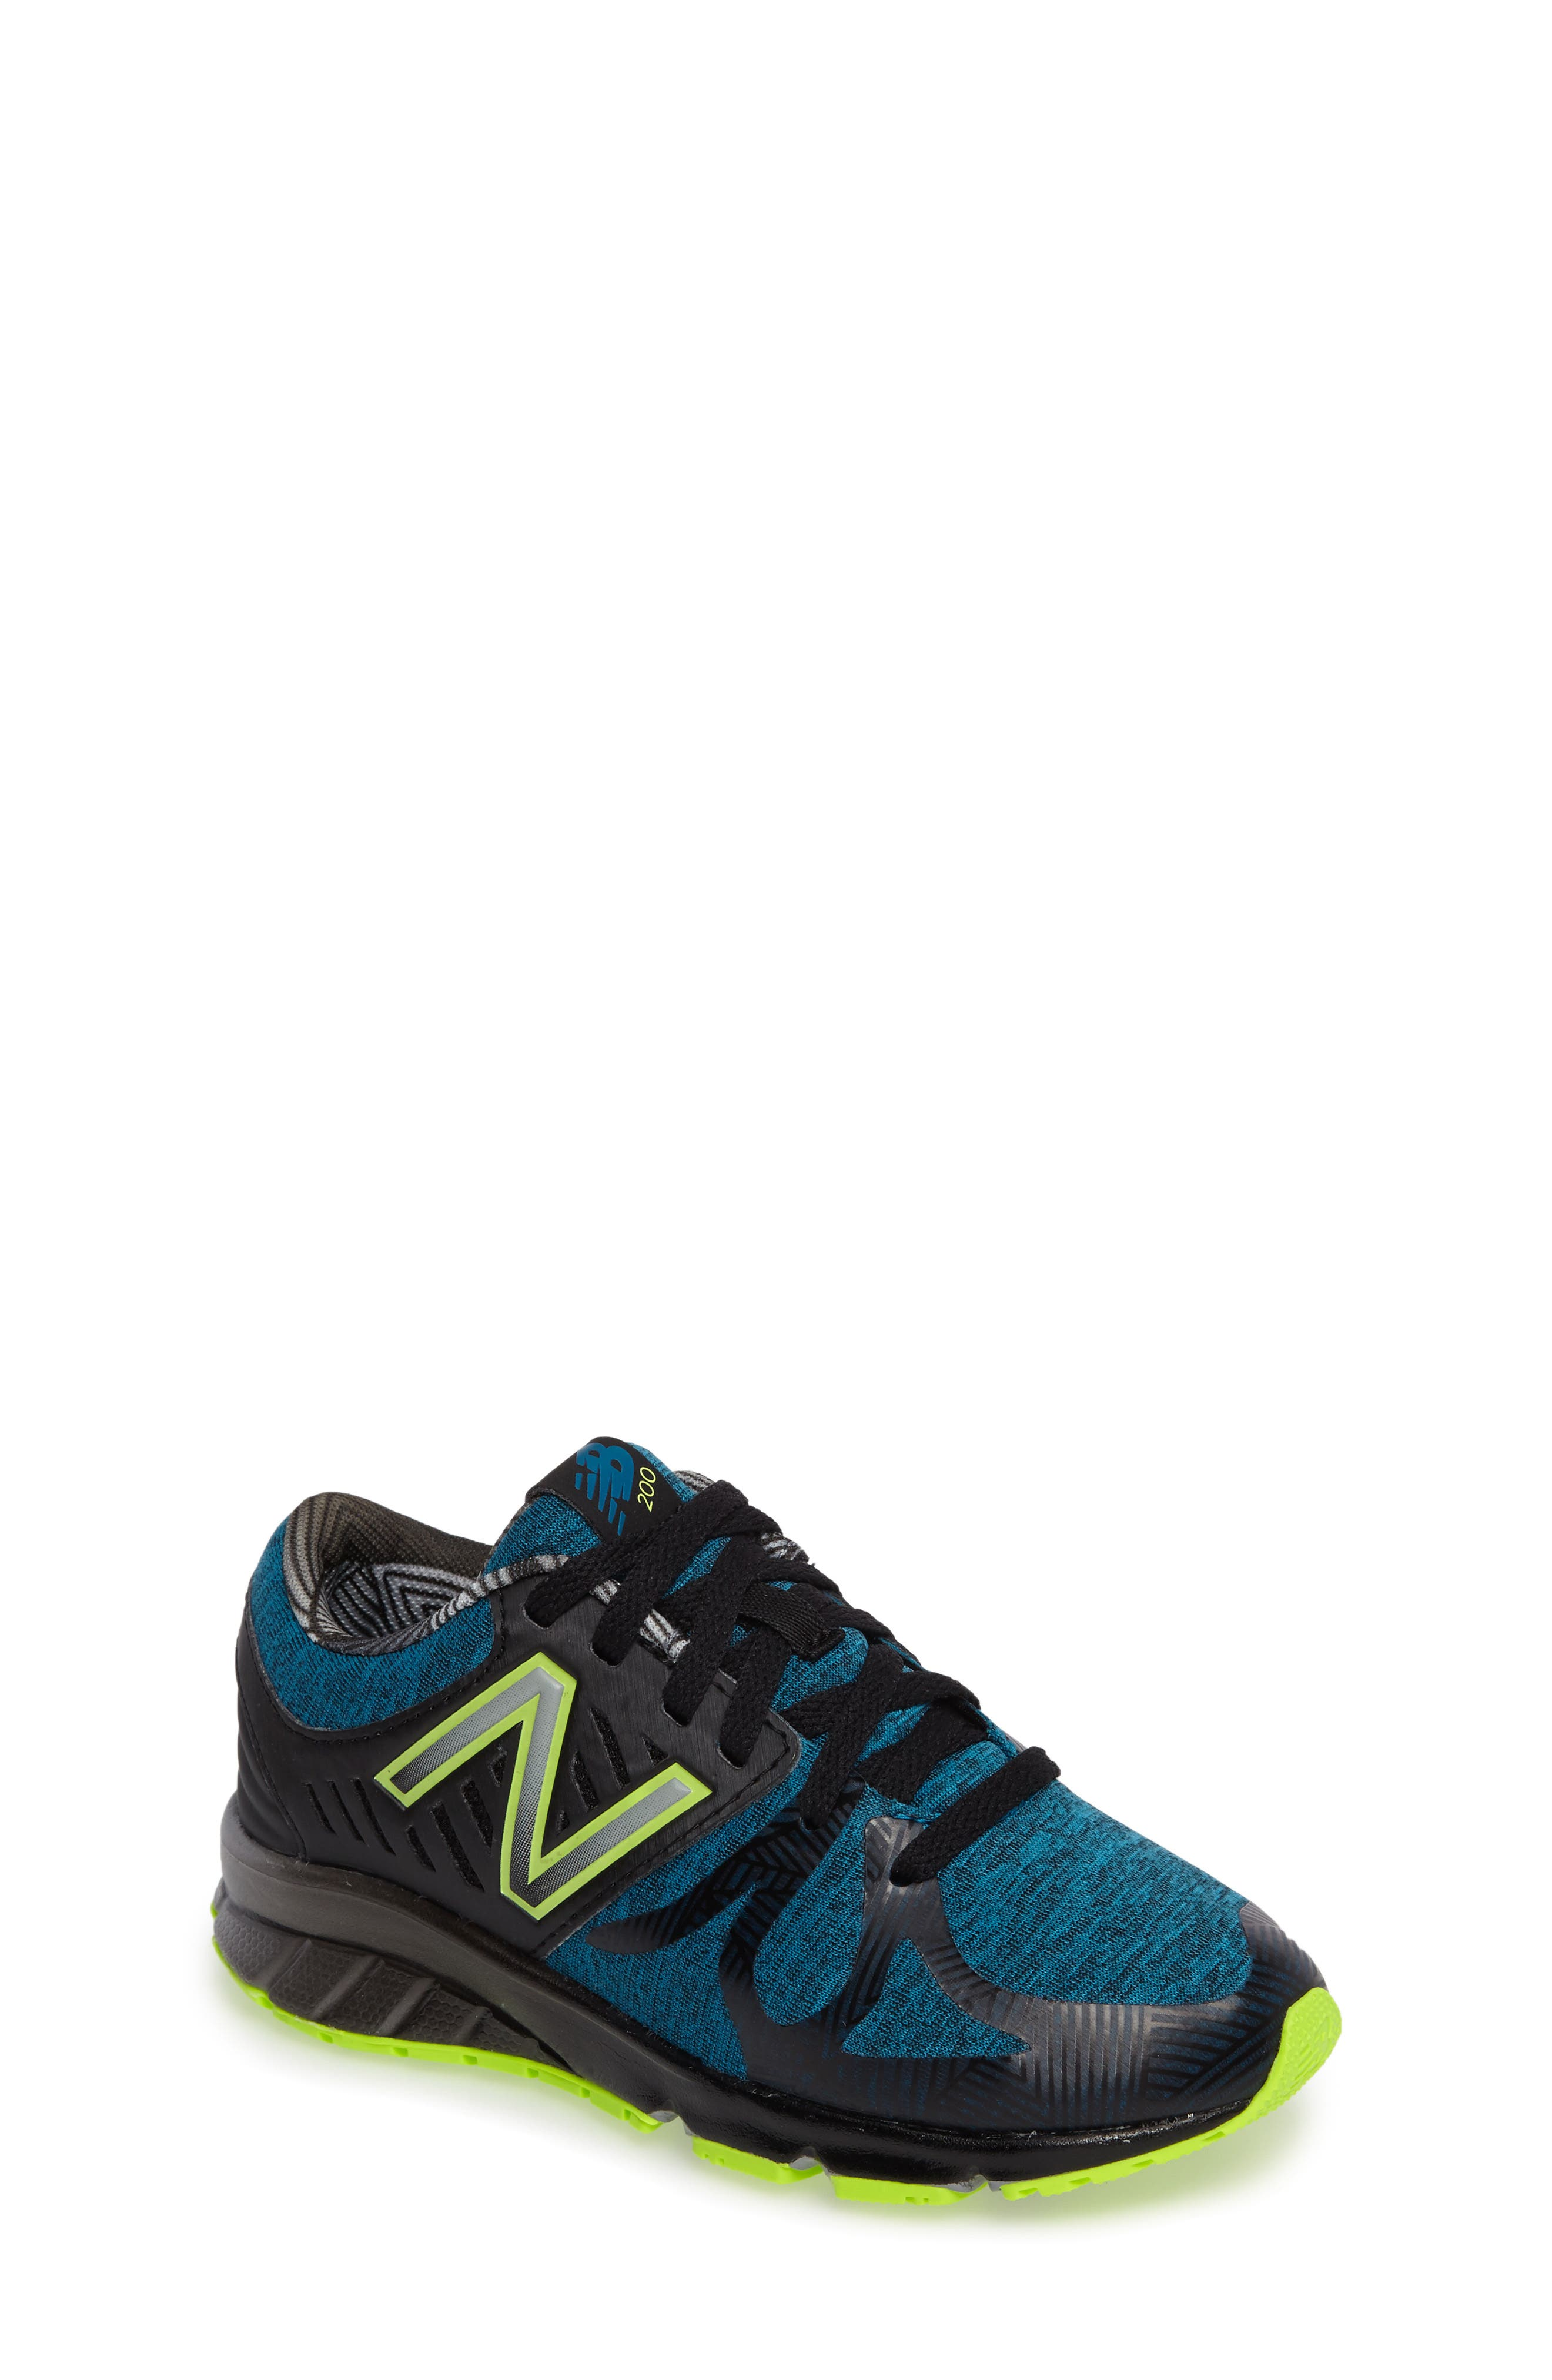 New Balance 200 Electric Rainbow Athletic Shoe (Toddler, Little Kid & Big Kid)